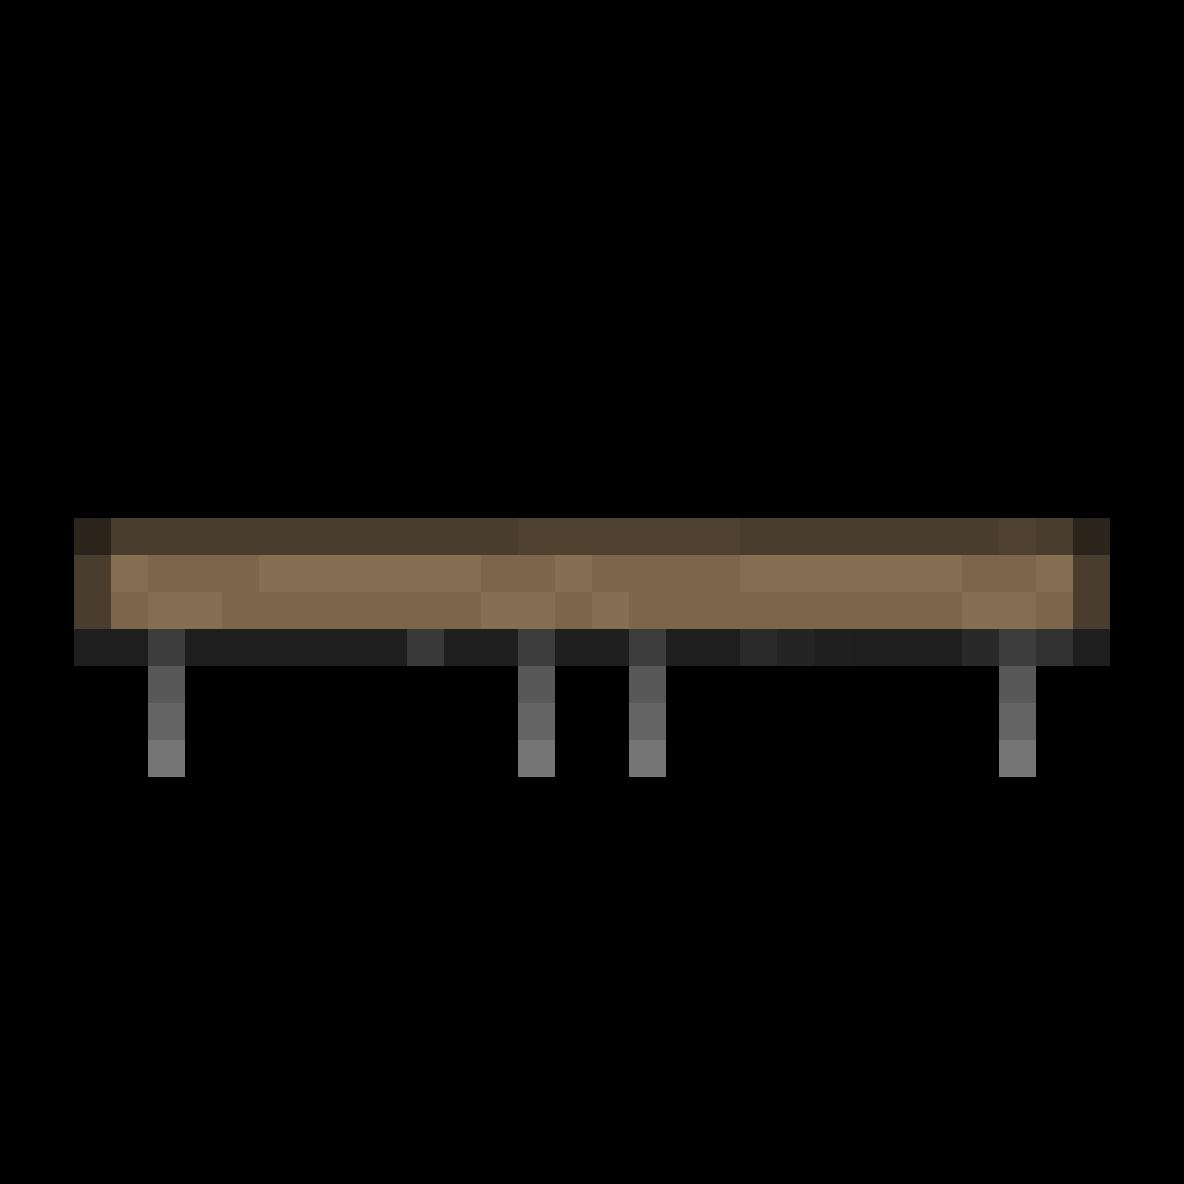 Platform by InkFlood